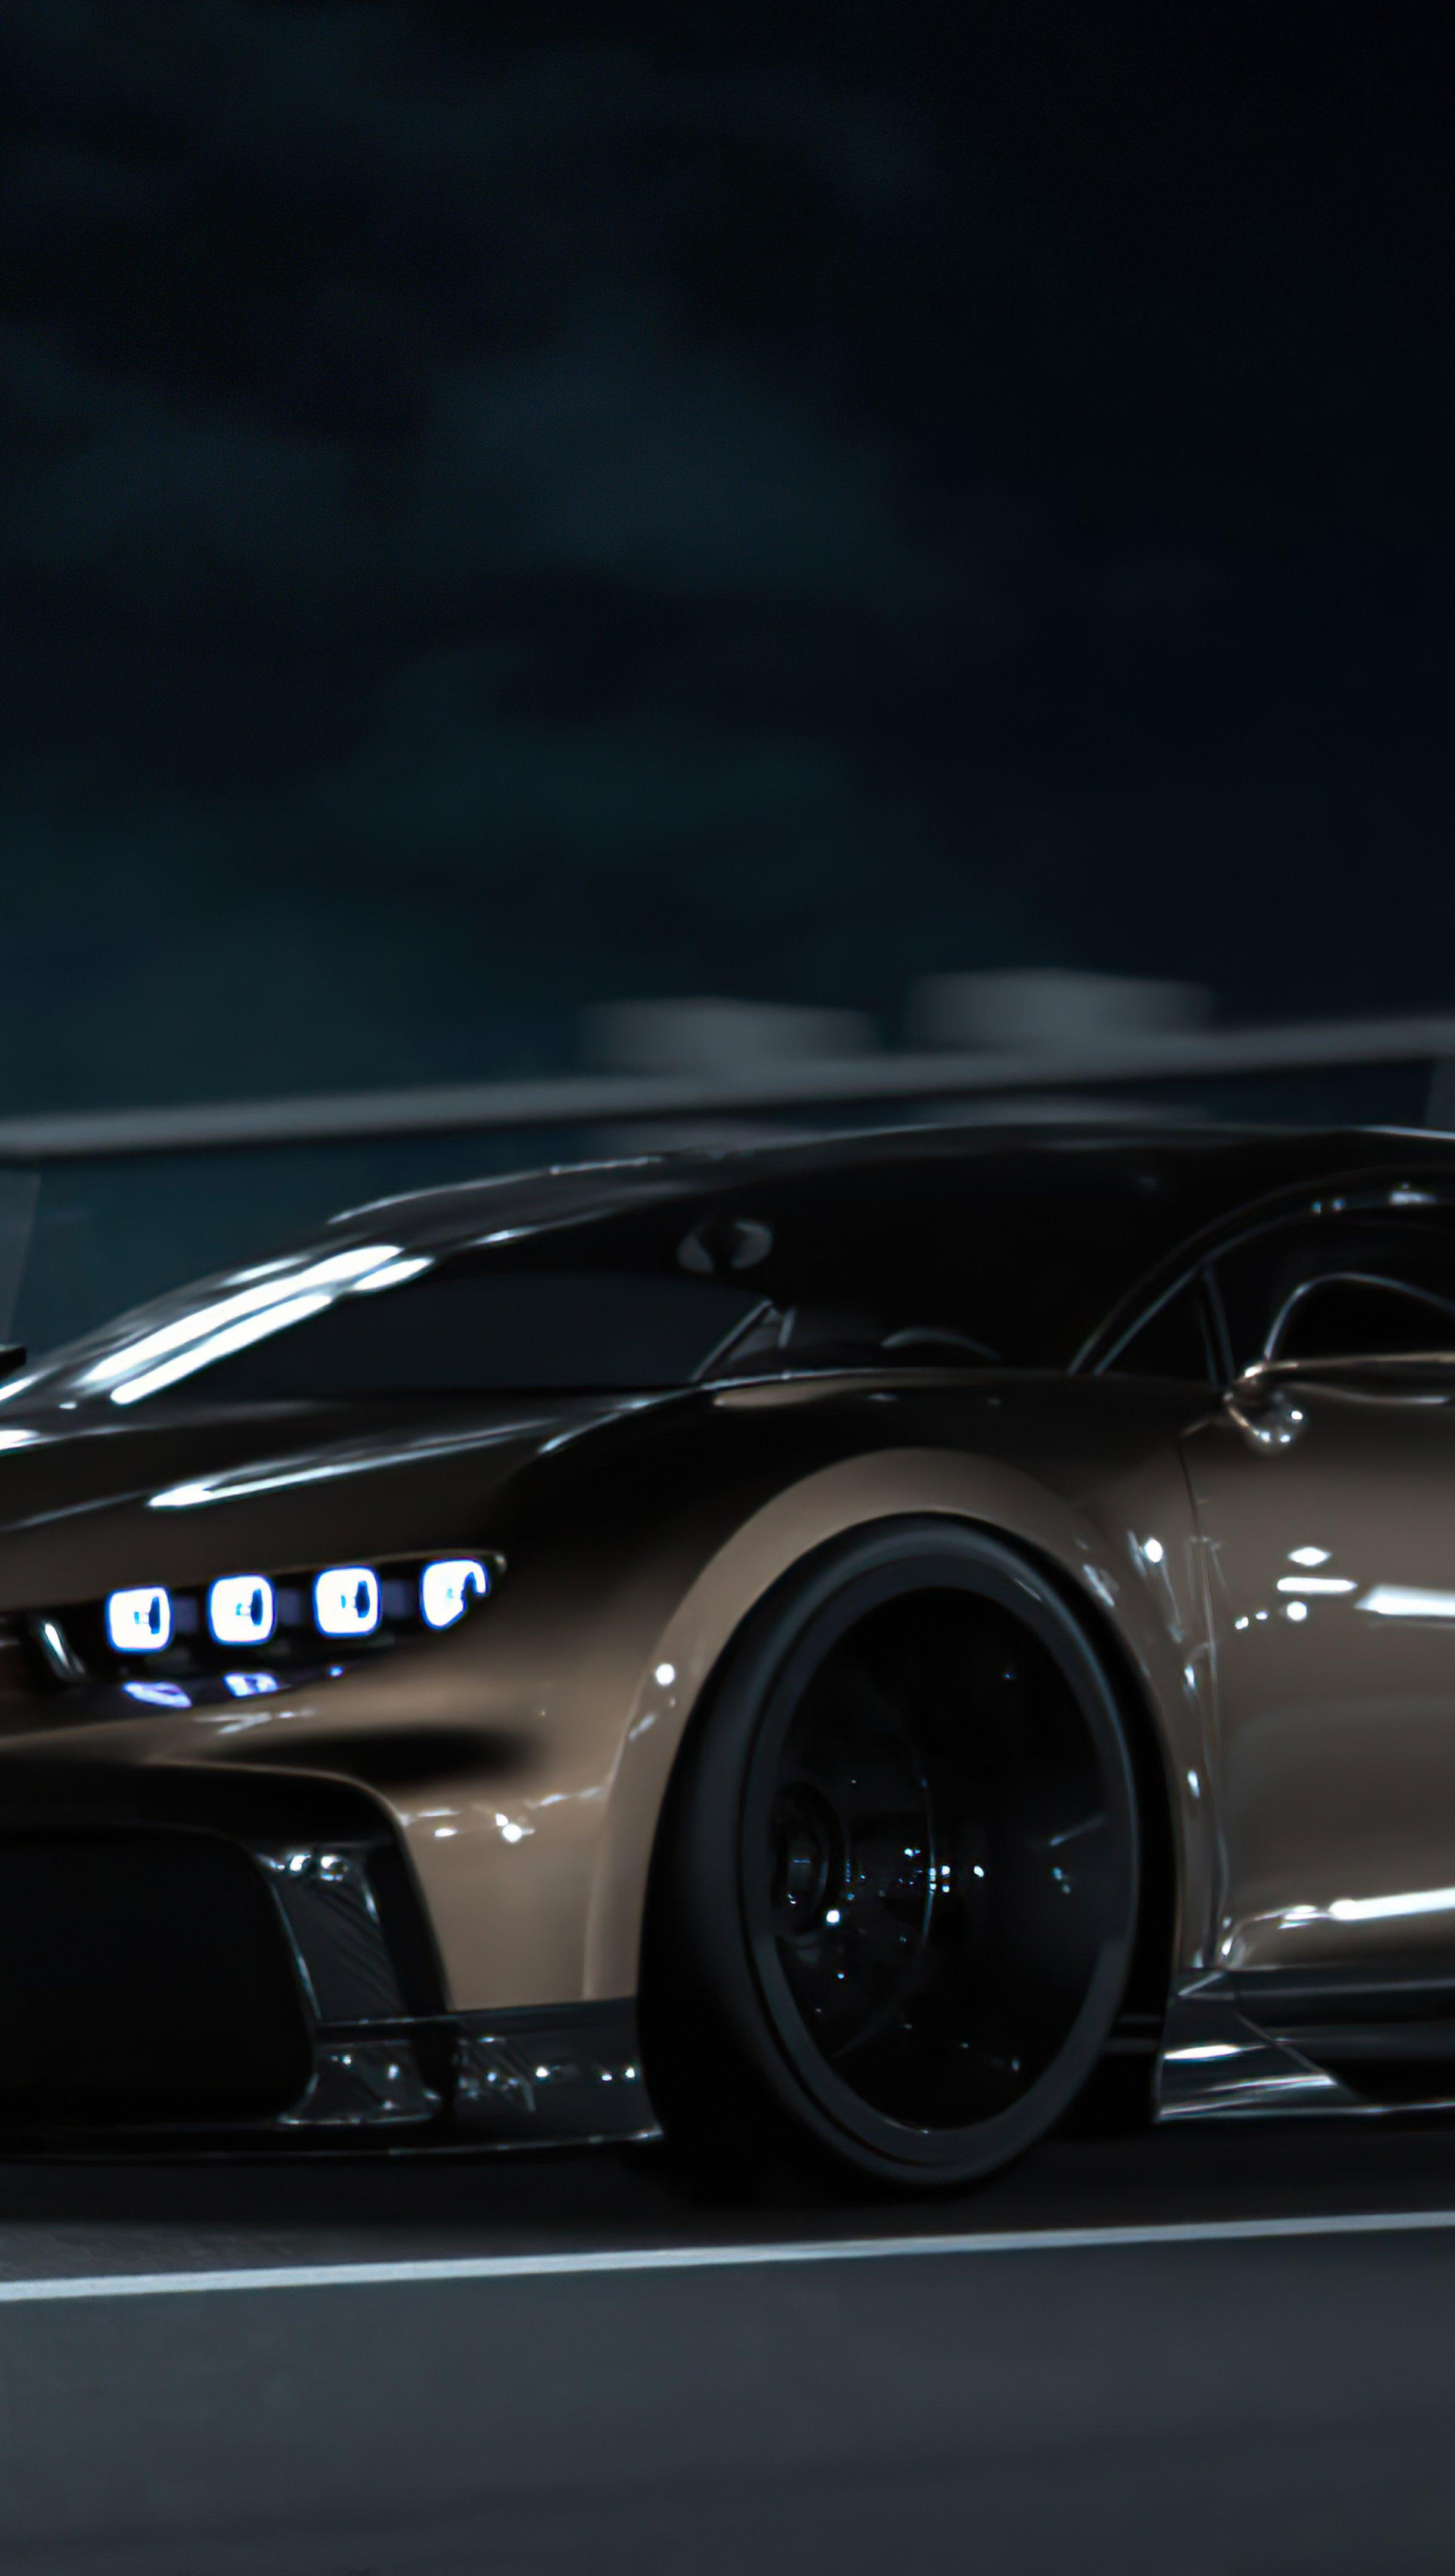 Fondos de pantalla Bugatti Chiron CGI Vertical